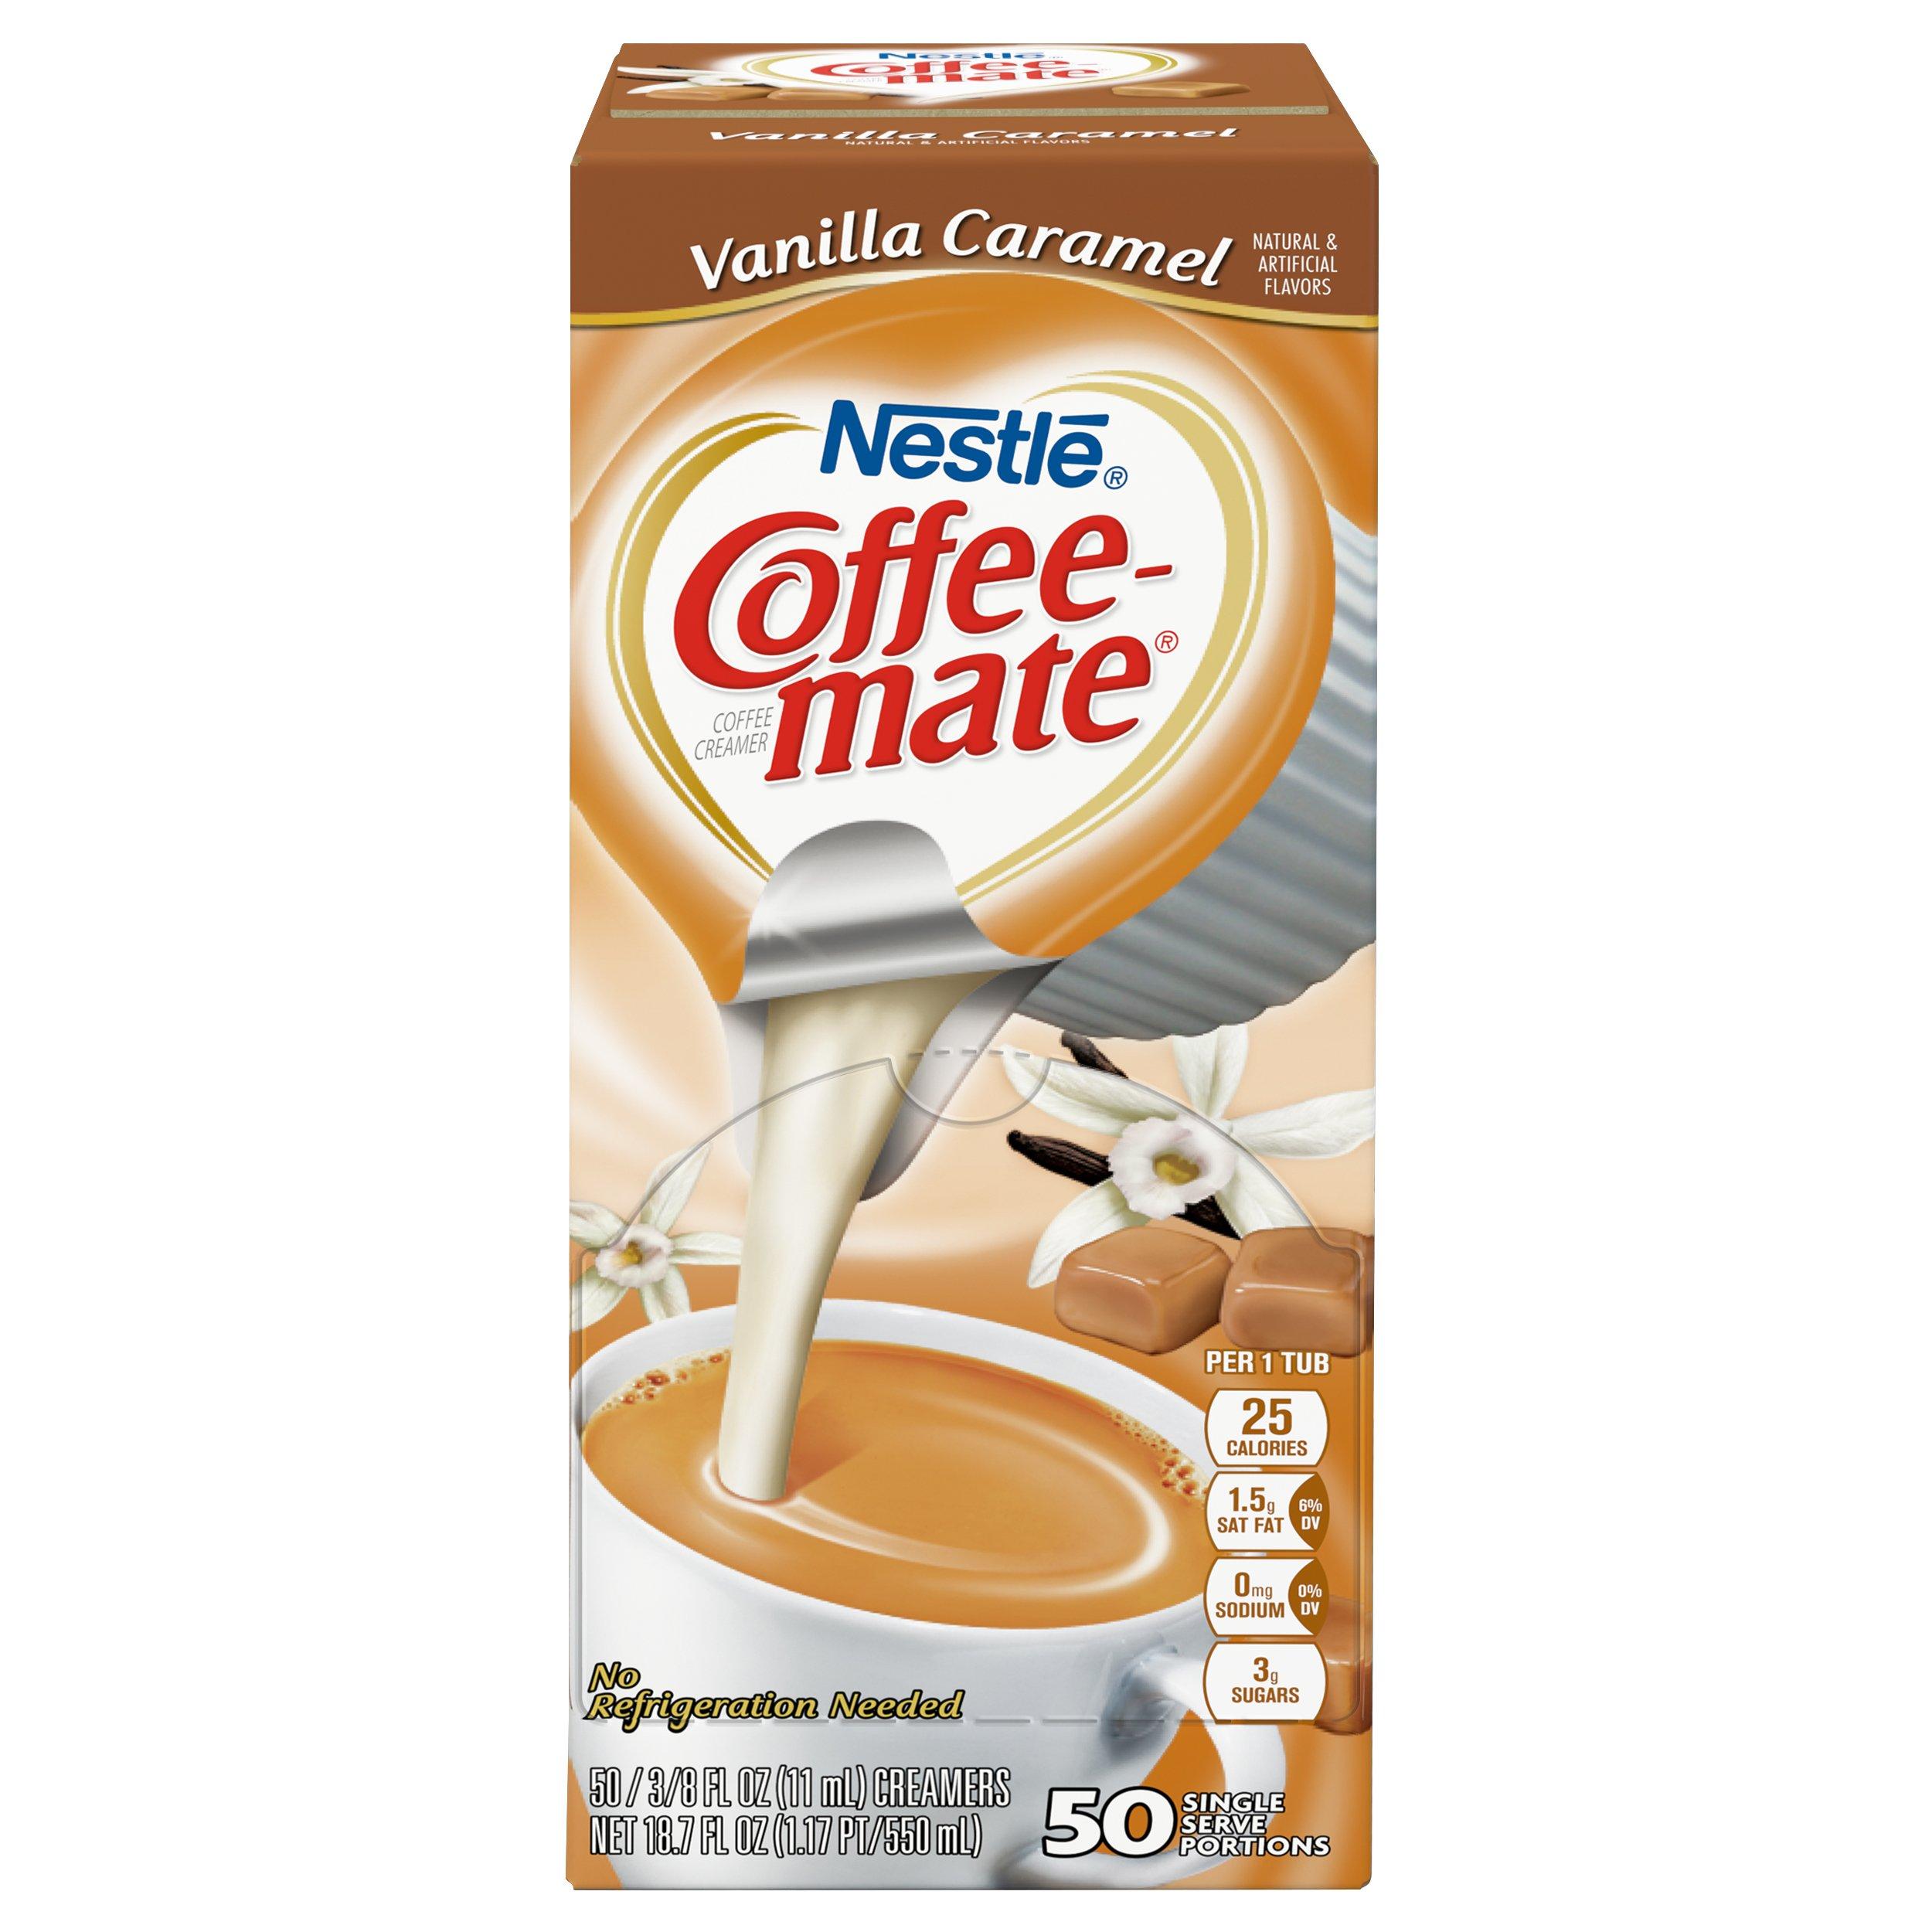 NESTLE COFFEE-MATE Coffee Creamer, Vanilla Caramel, liquid creamer singles, Pack of 50 by Nestle Coffee Mate (Image #2)